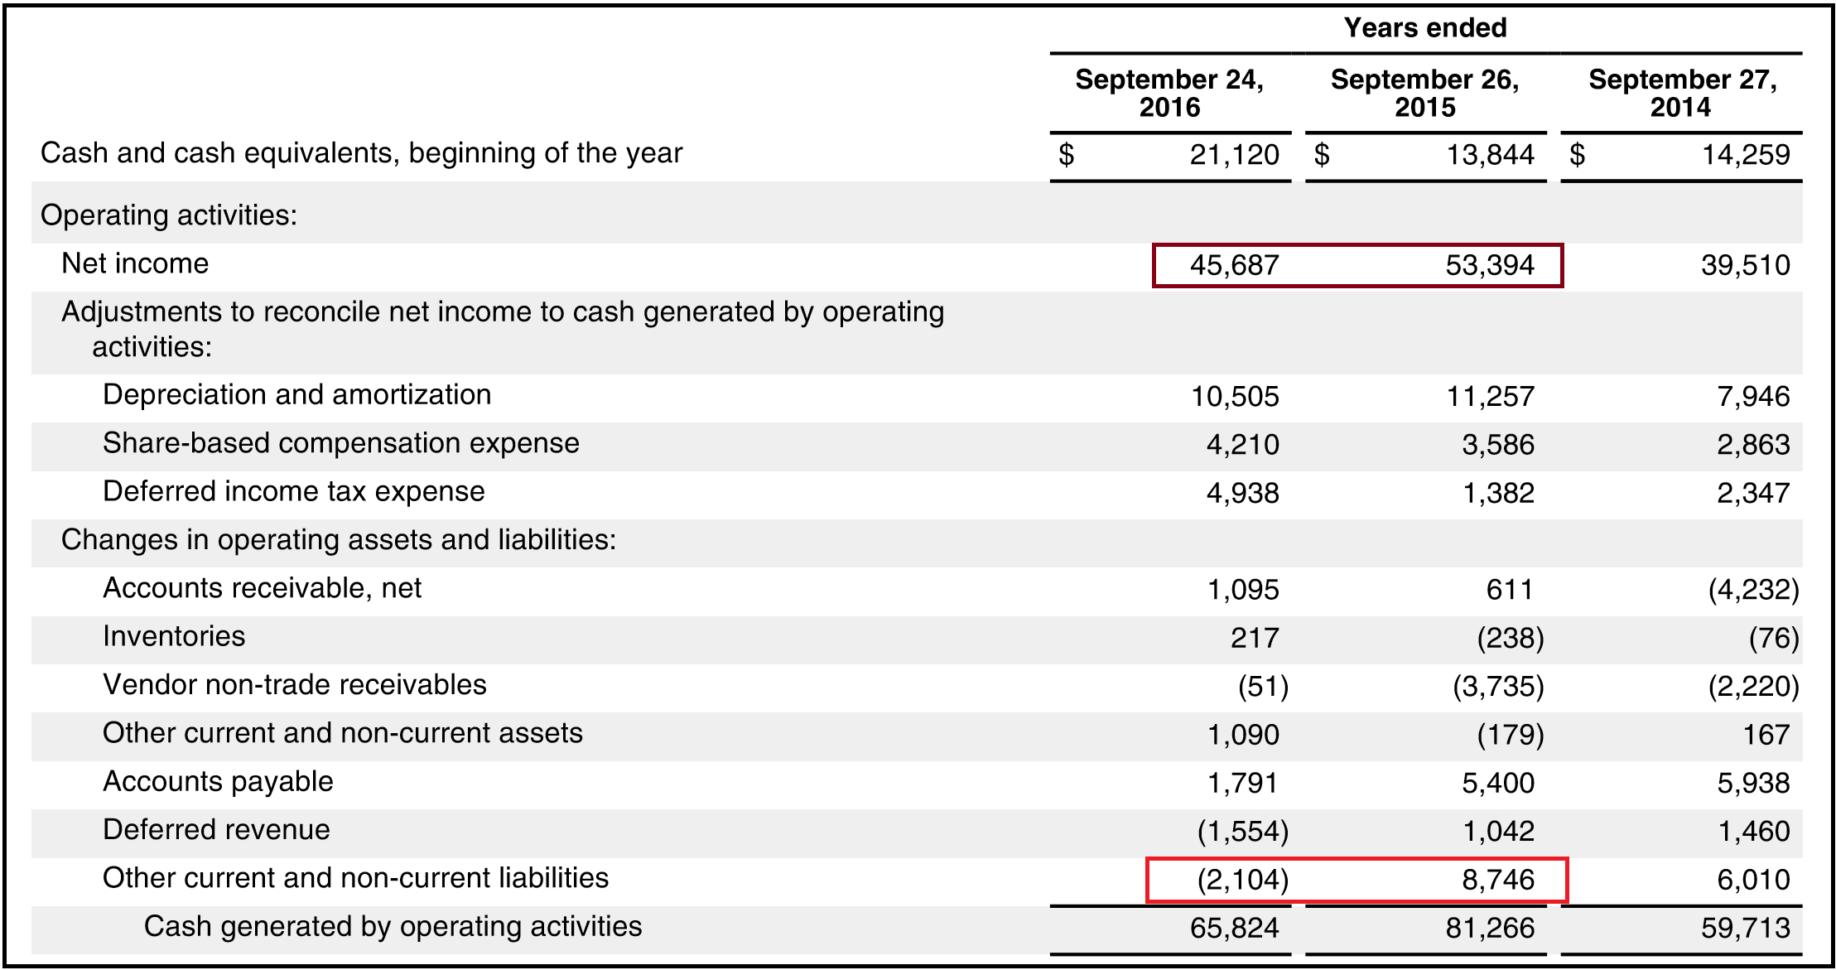 Free Cash Flow Spreadsheet For Valuing Apple Using 3 Different Free Cash Flow Scenarios  Apple Inc